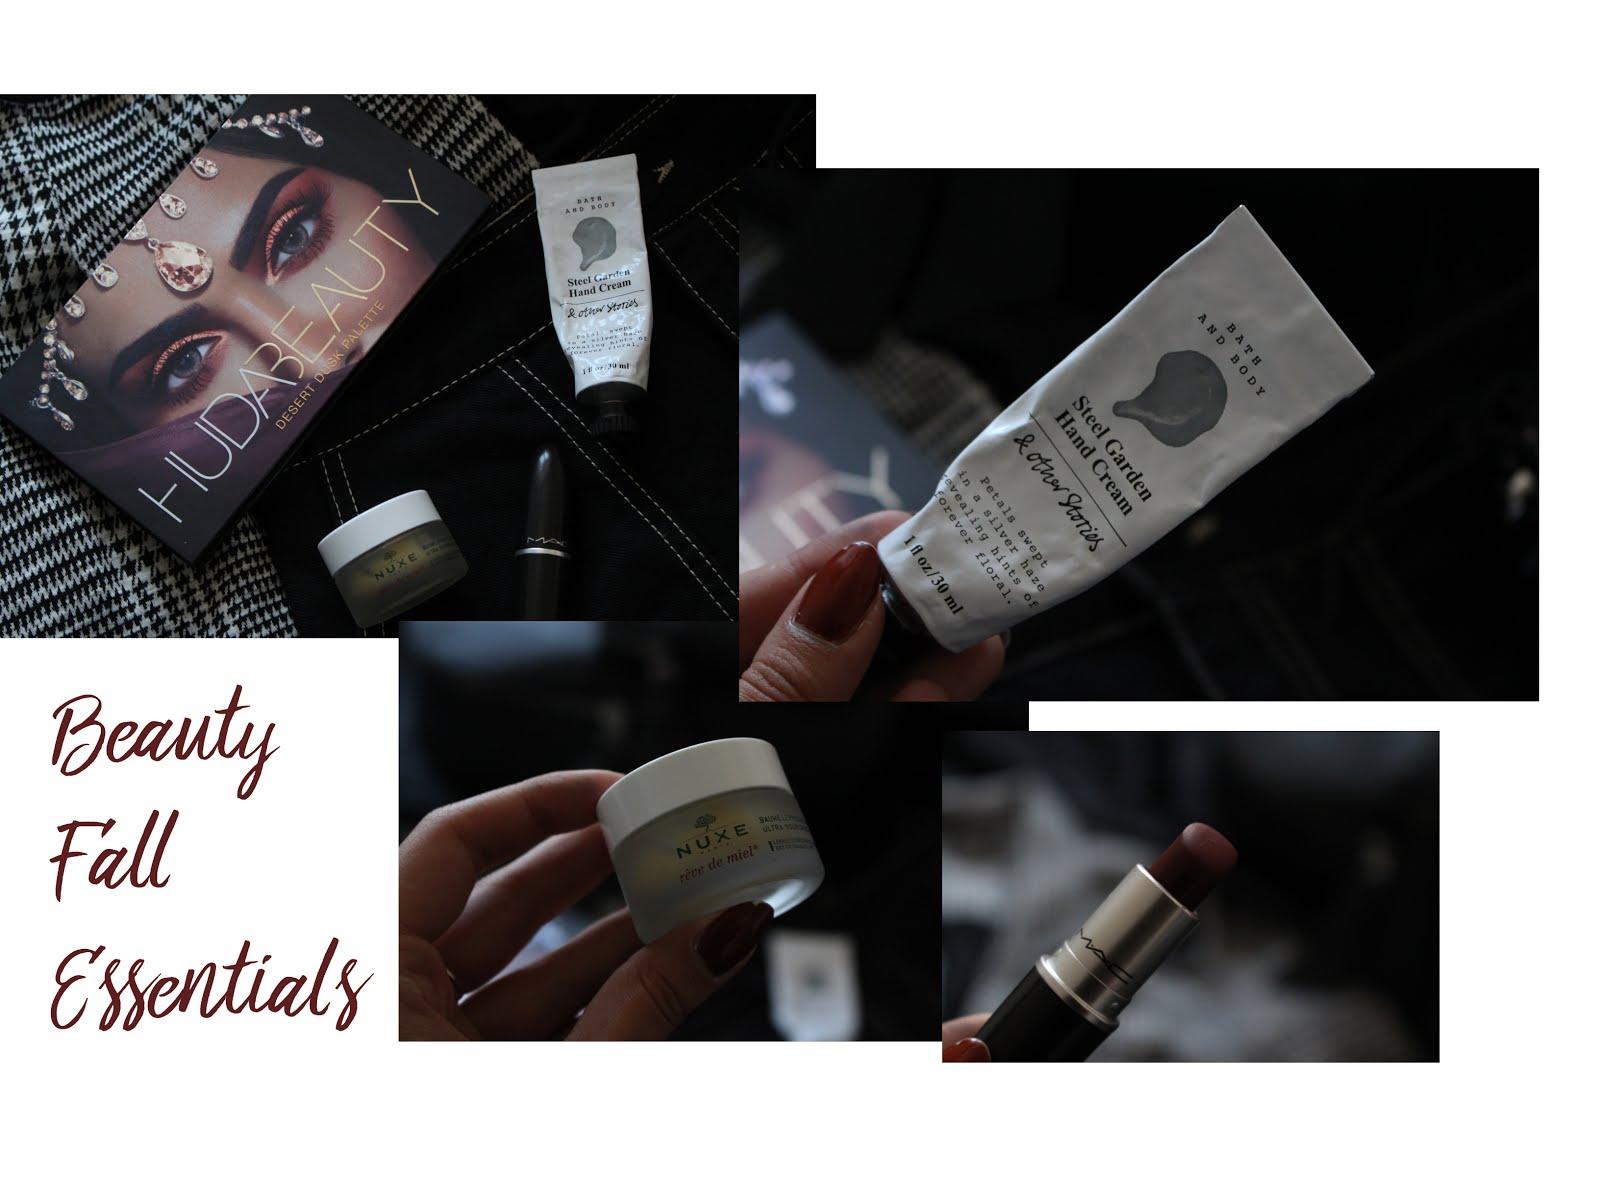 beauty, beauty winter essentials, huda beauty, hued beauty new palette, huda beauty desert dust, mac diva, mac lipstick, nuxe, nuxe lip balm, nelly ray, nelly ray blog, beauty blogger, blogger